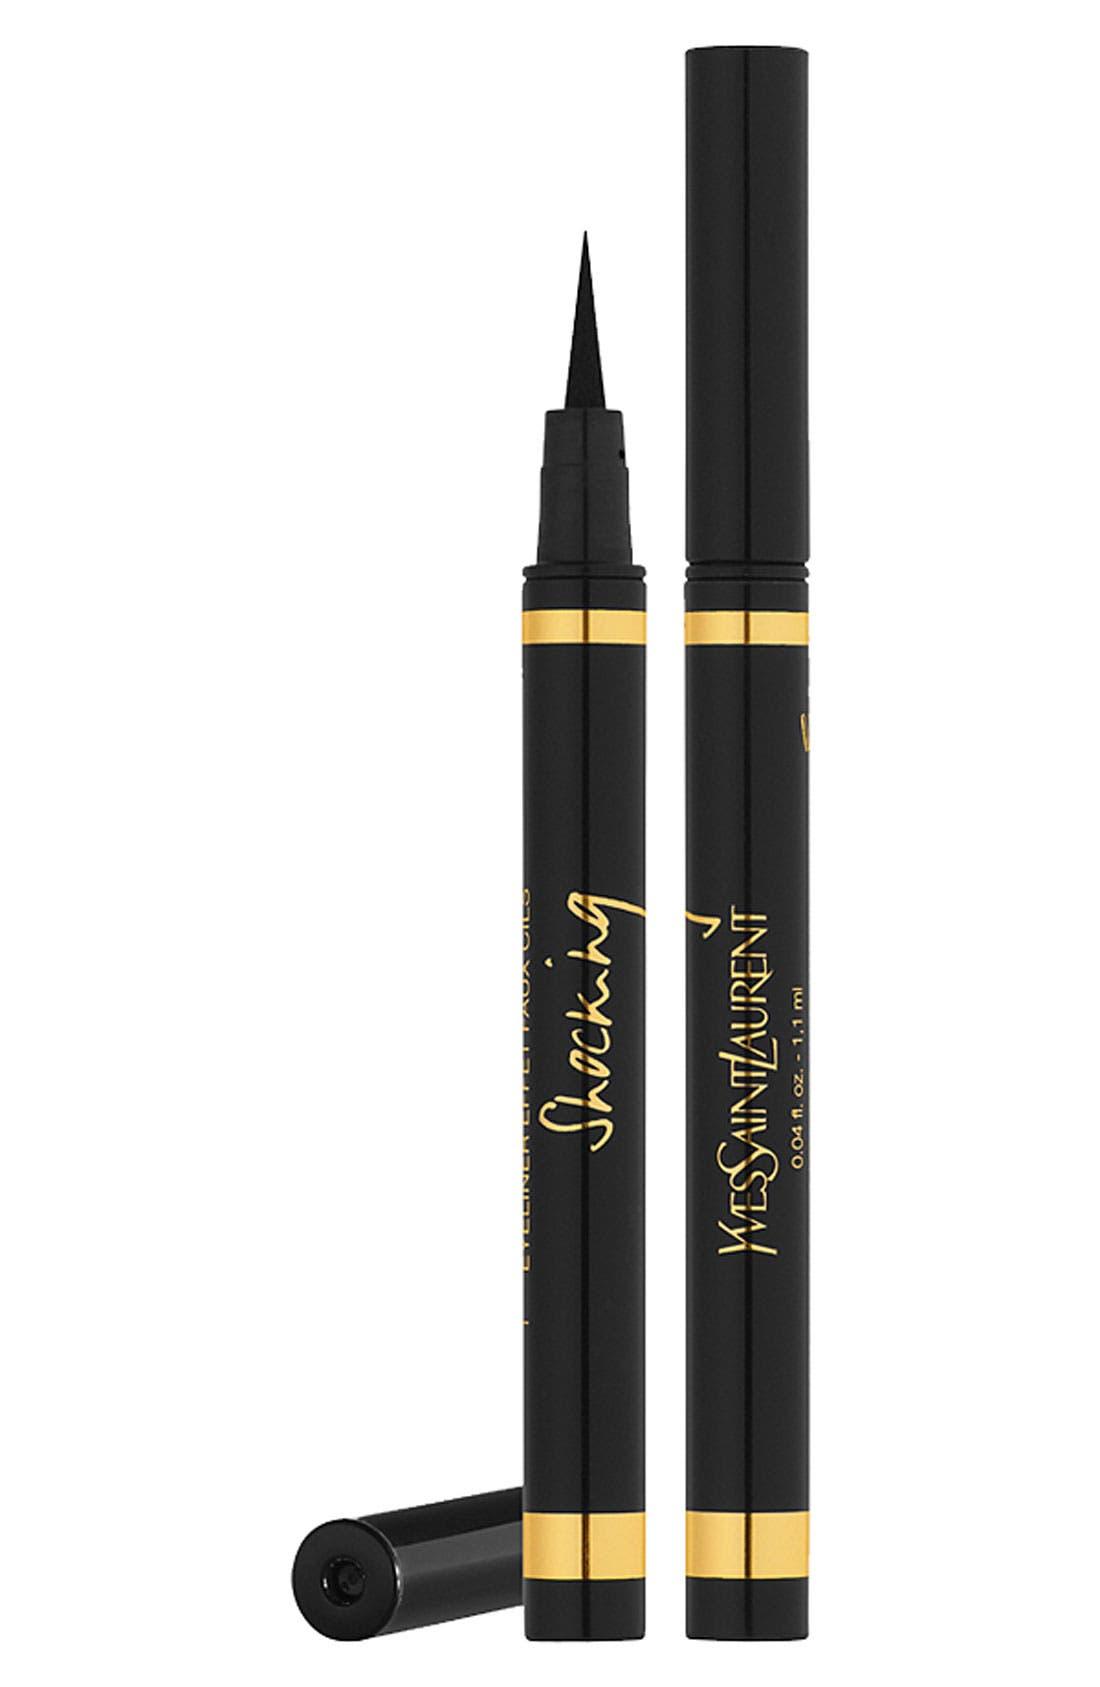 Eyeliner Effet Faux Cils Bold Felt Tip Eyeliner Pen,                             Main thumbnail 1, color,                             001